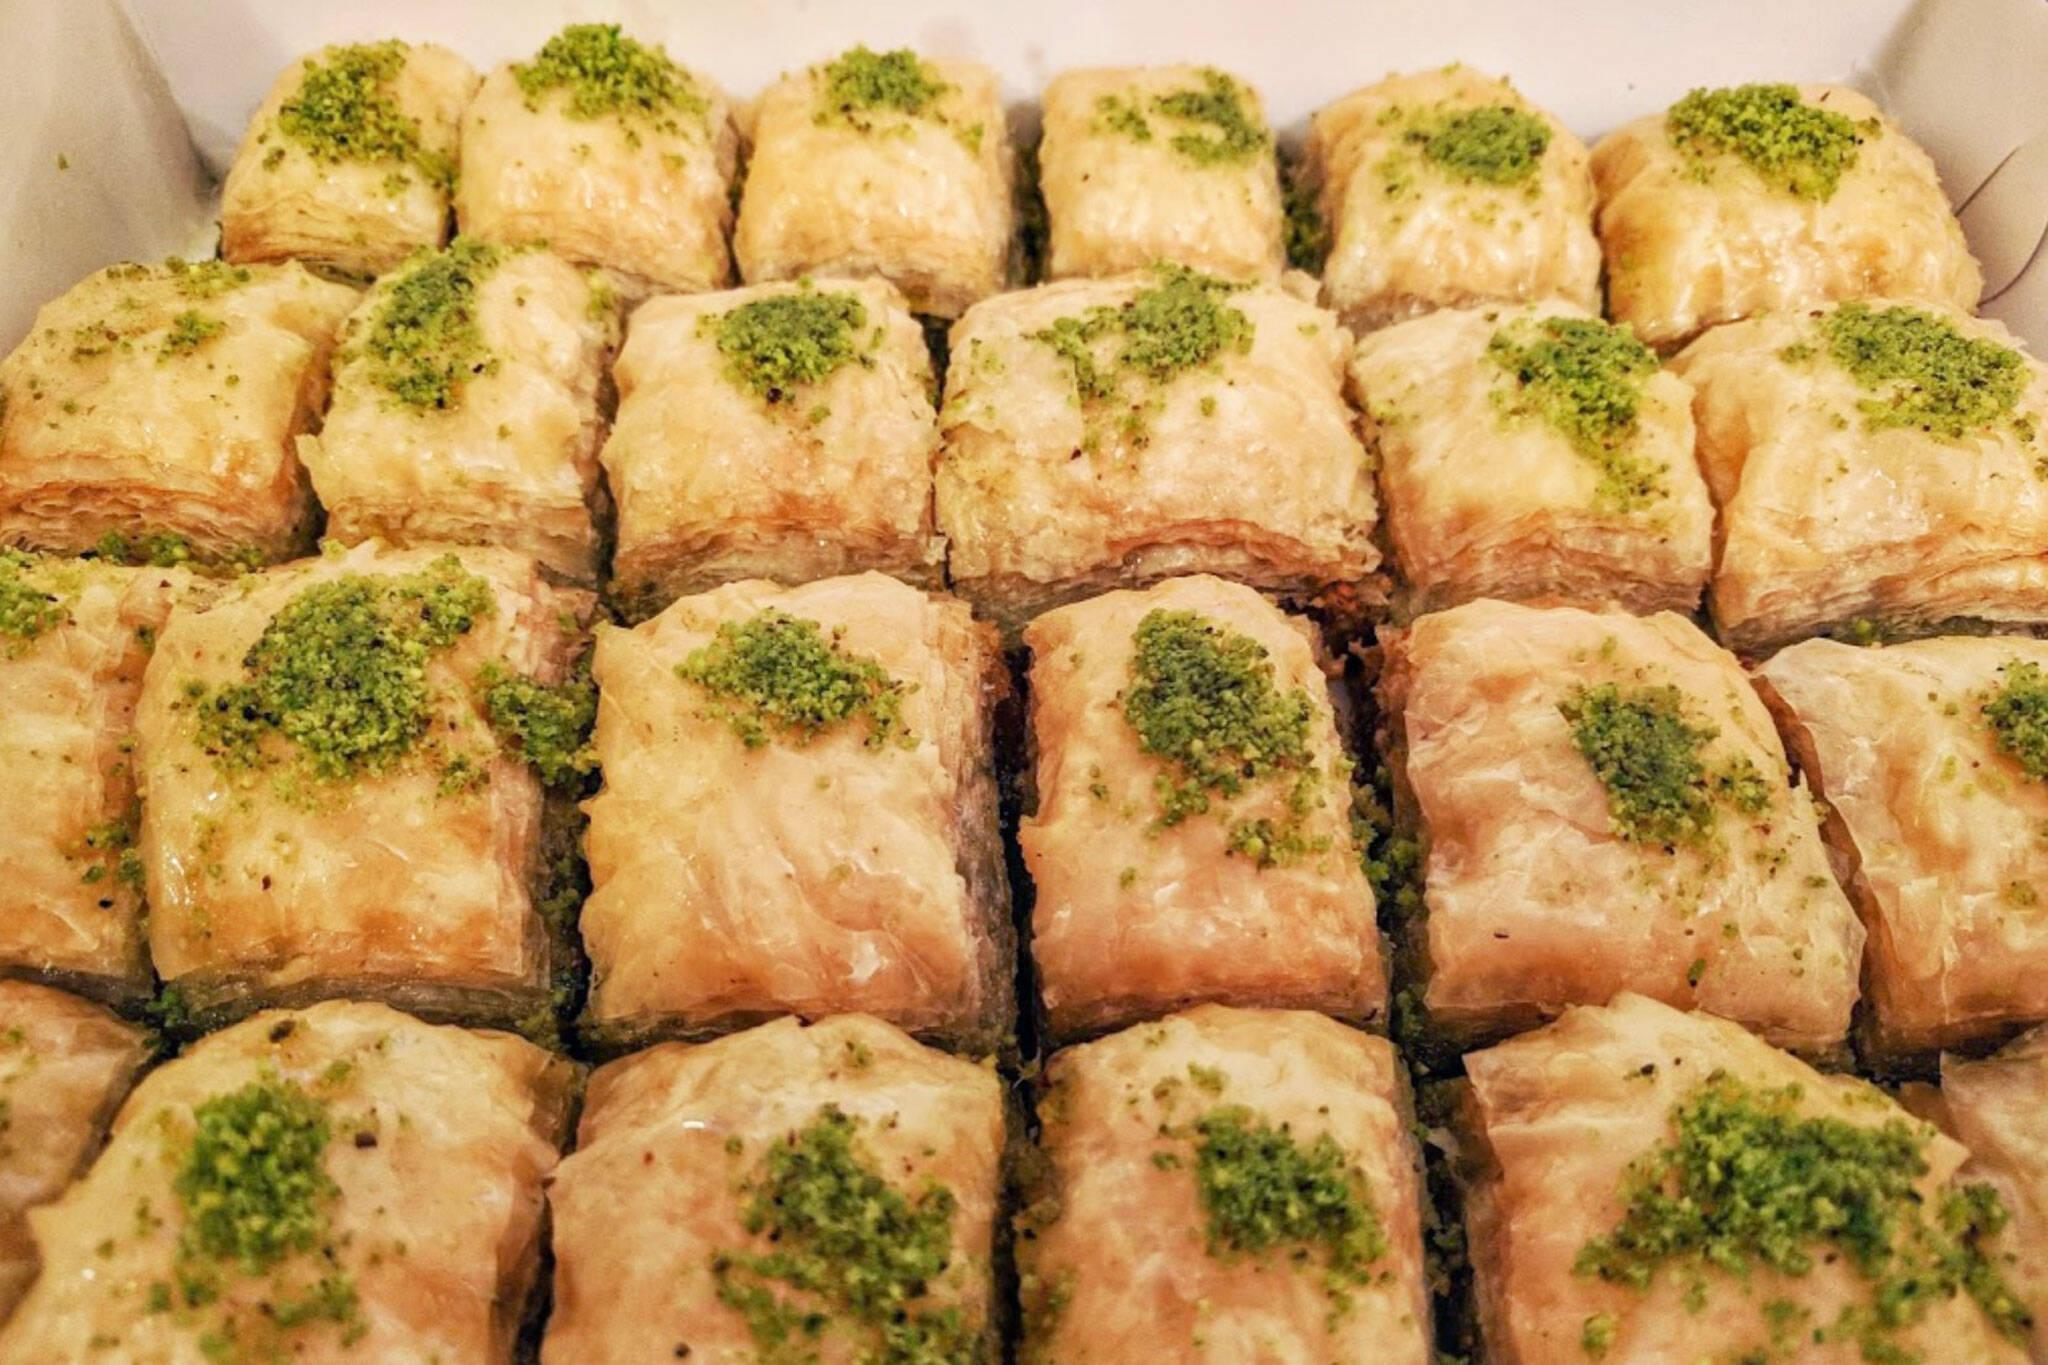 narin pastry toronto